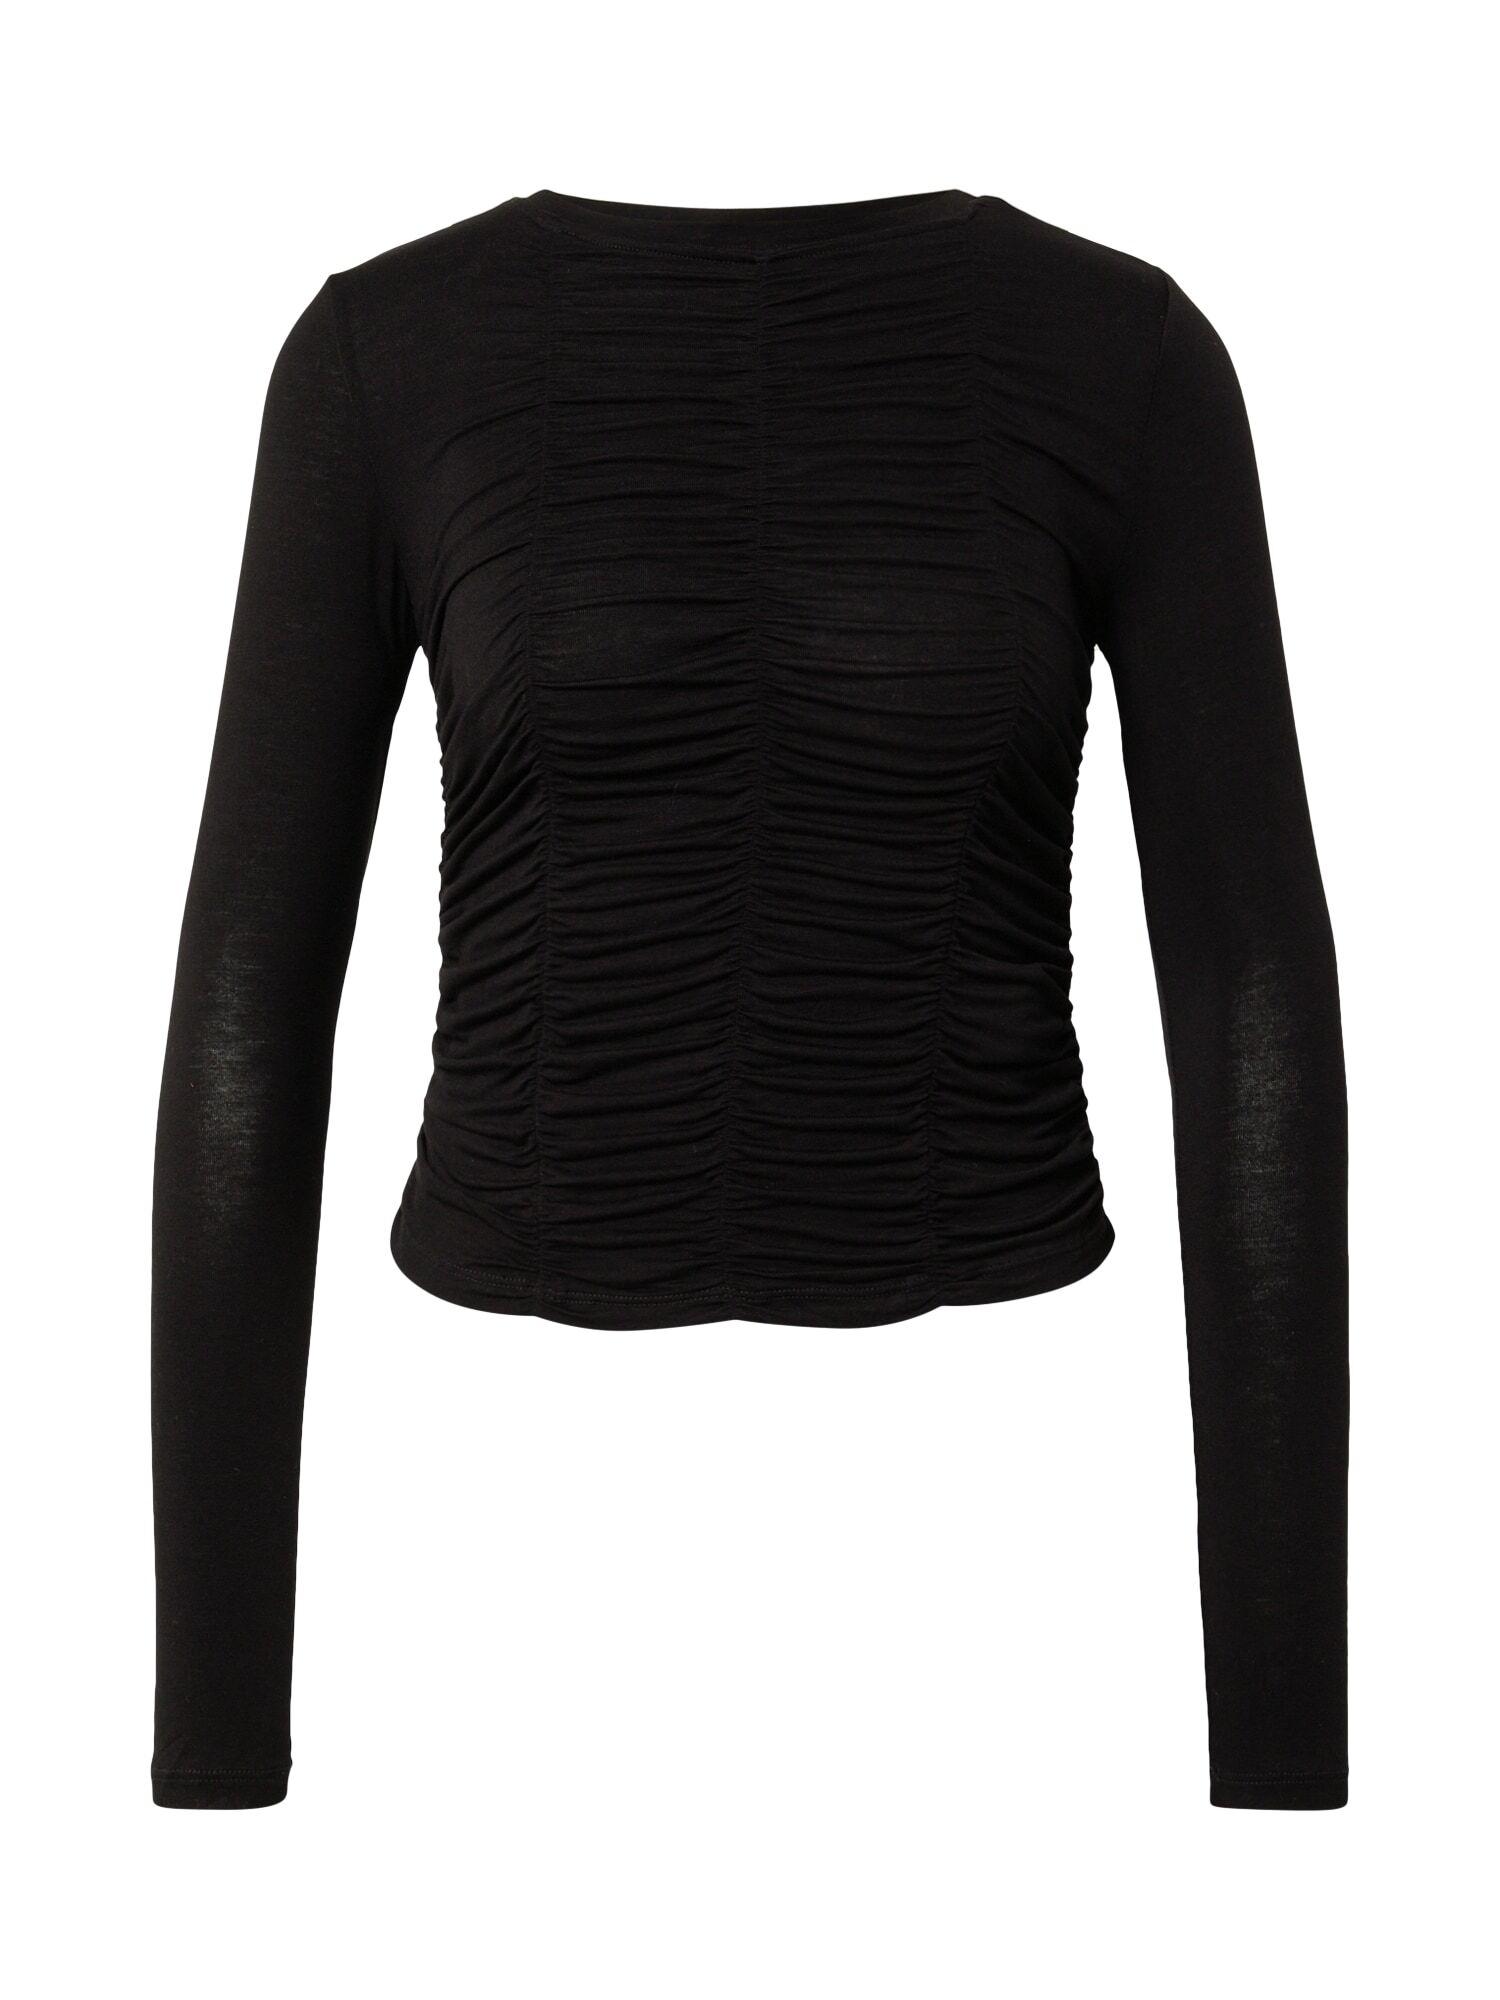 Gina Tricot Haut 'Catti'  - Noir - Taille: XL - female